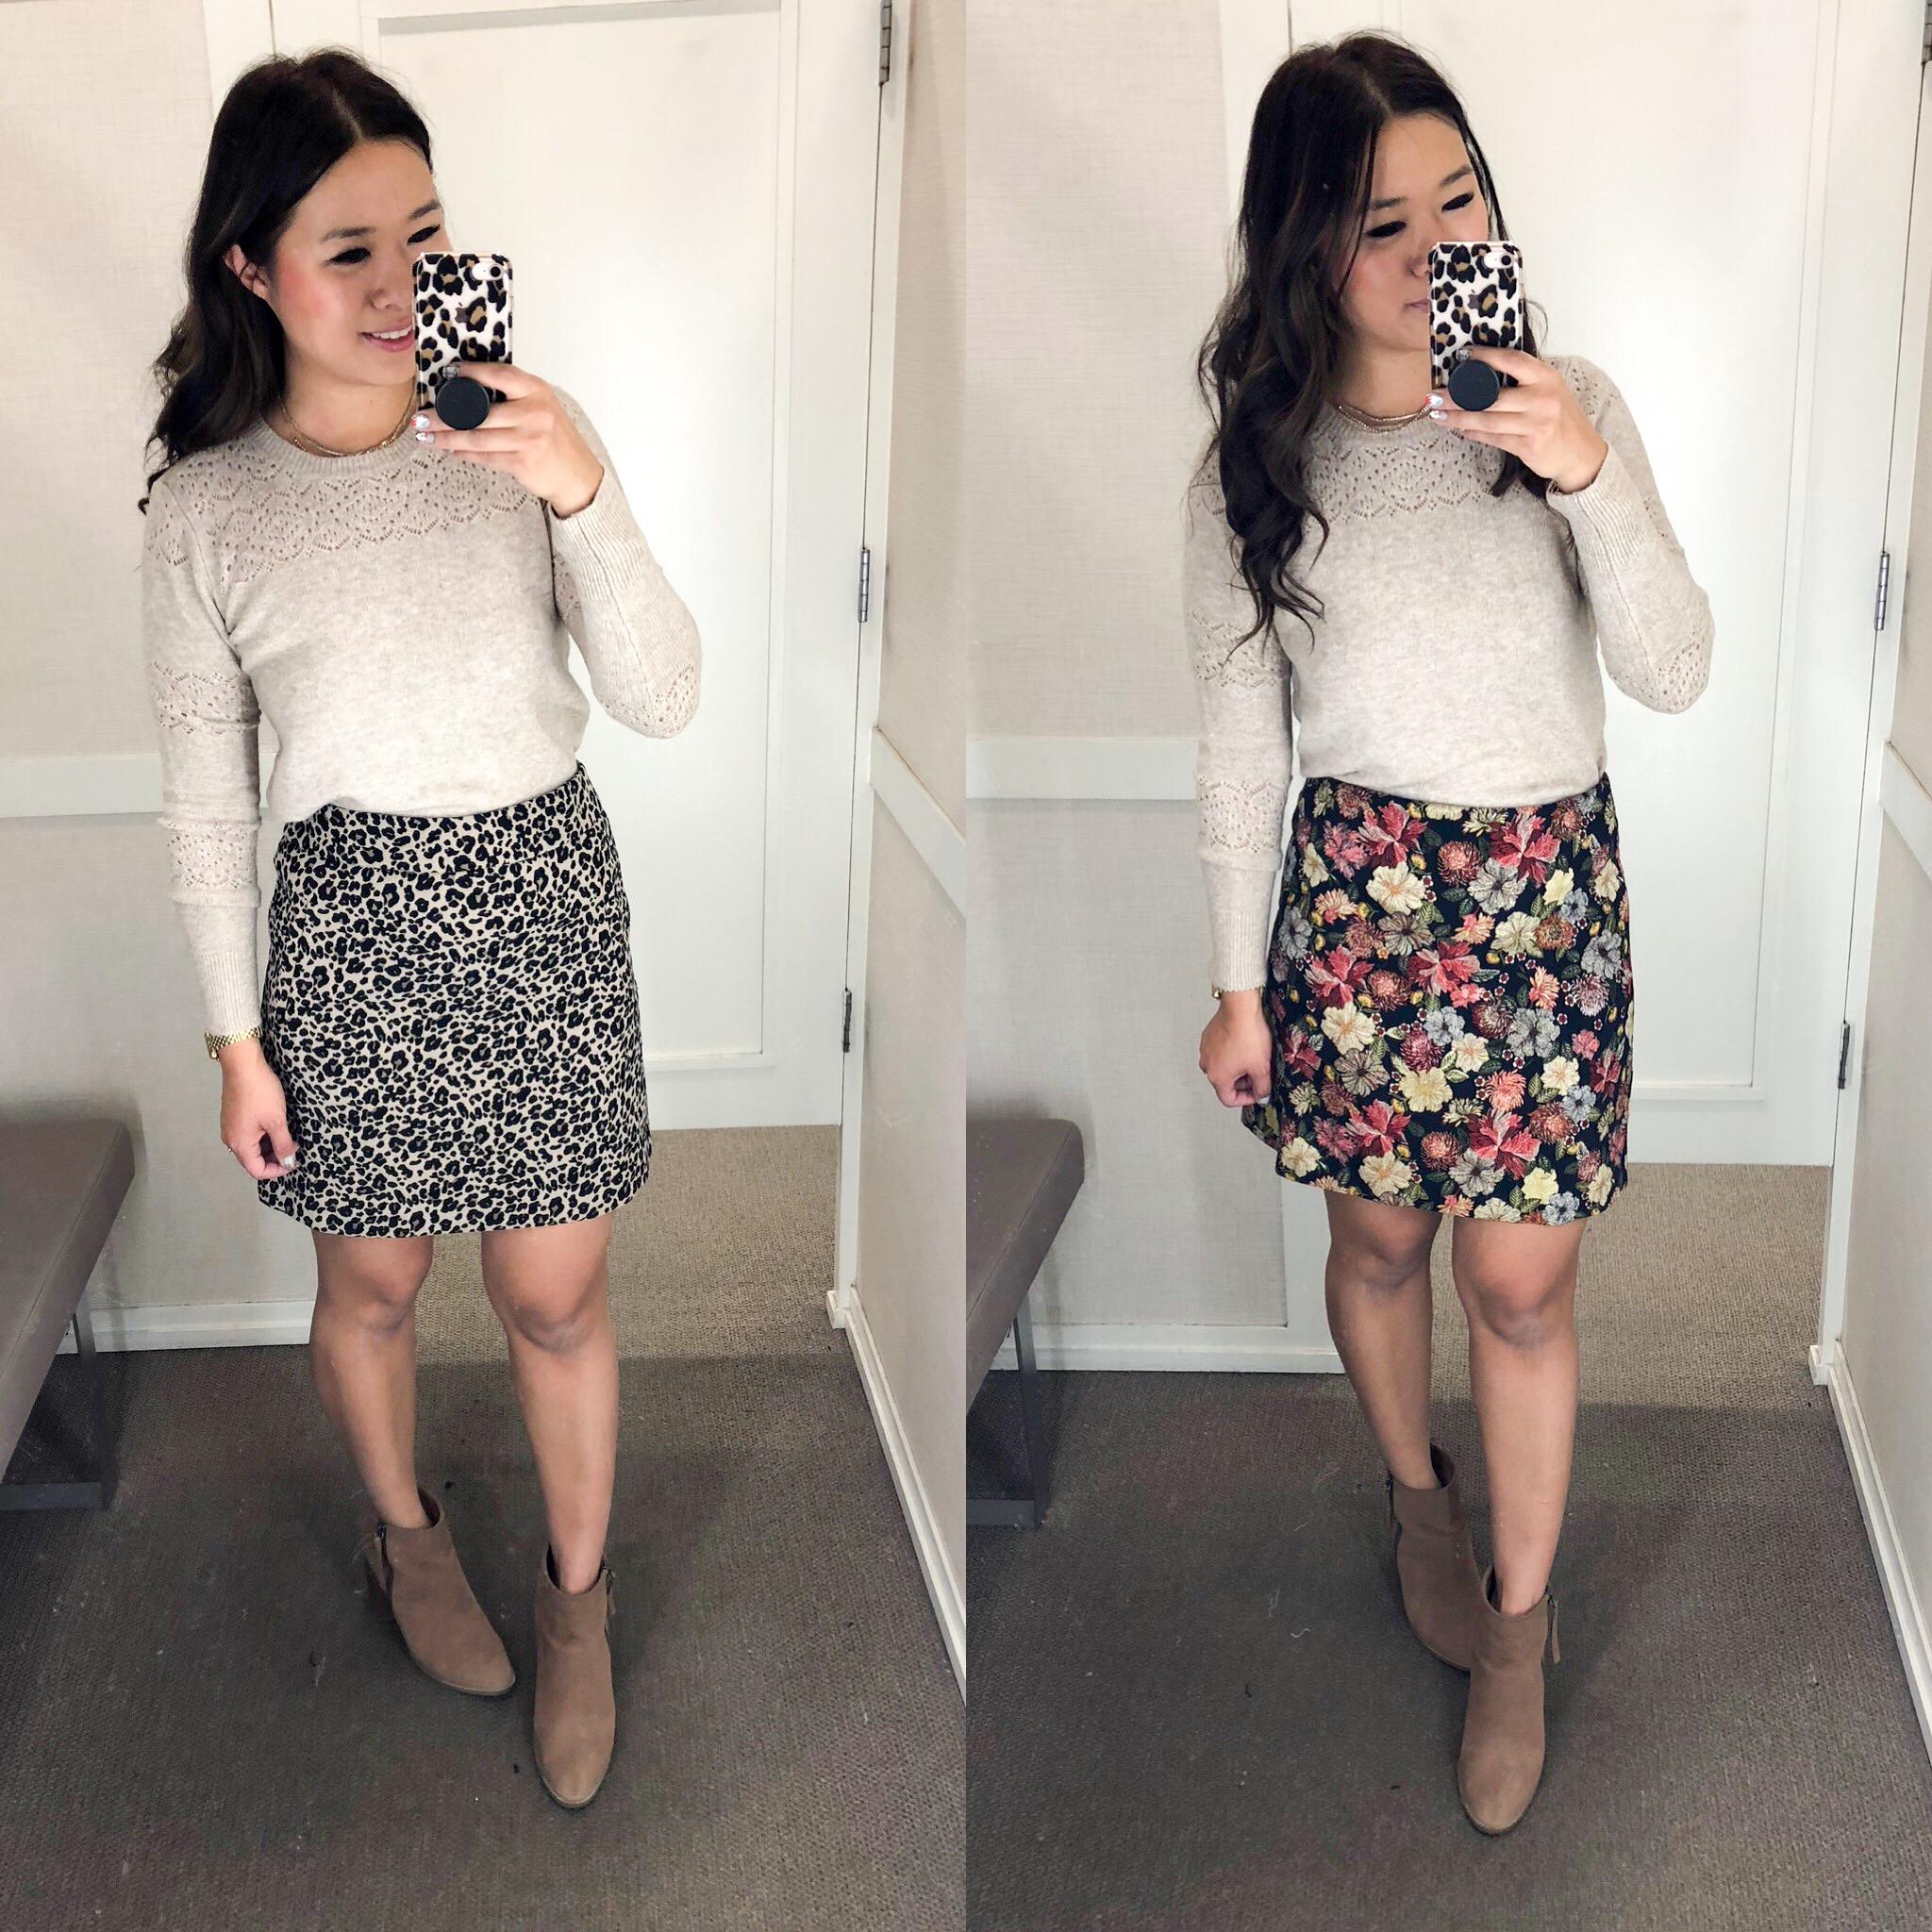 5dbb4b31cc Lacey Pointelle Sweater (Size Small) // Leopard Jacquard Pocket Skirt (Size  6) // Floral Jacquard Shift Skirt (Size 6)